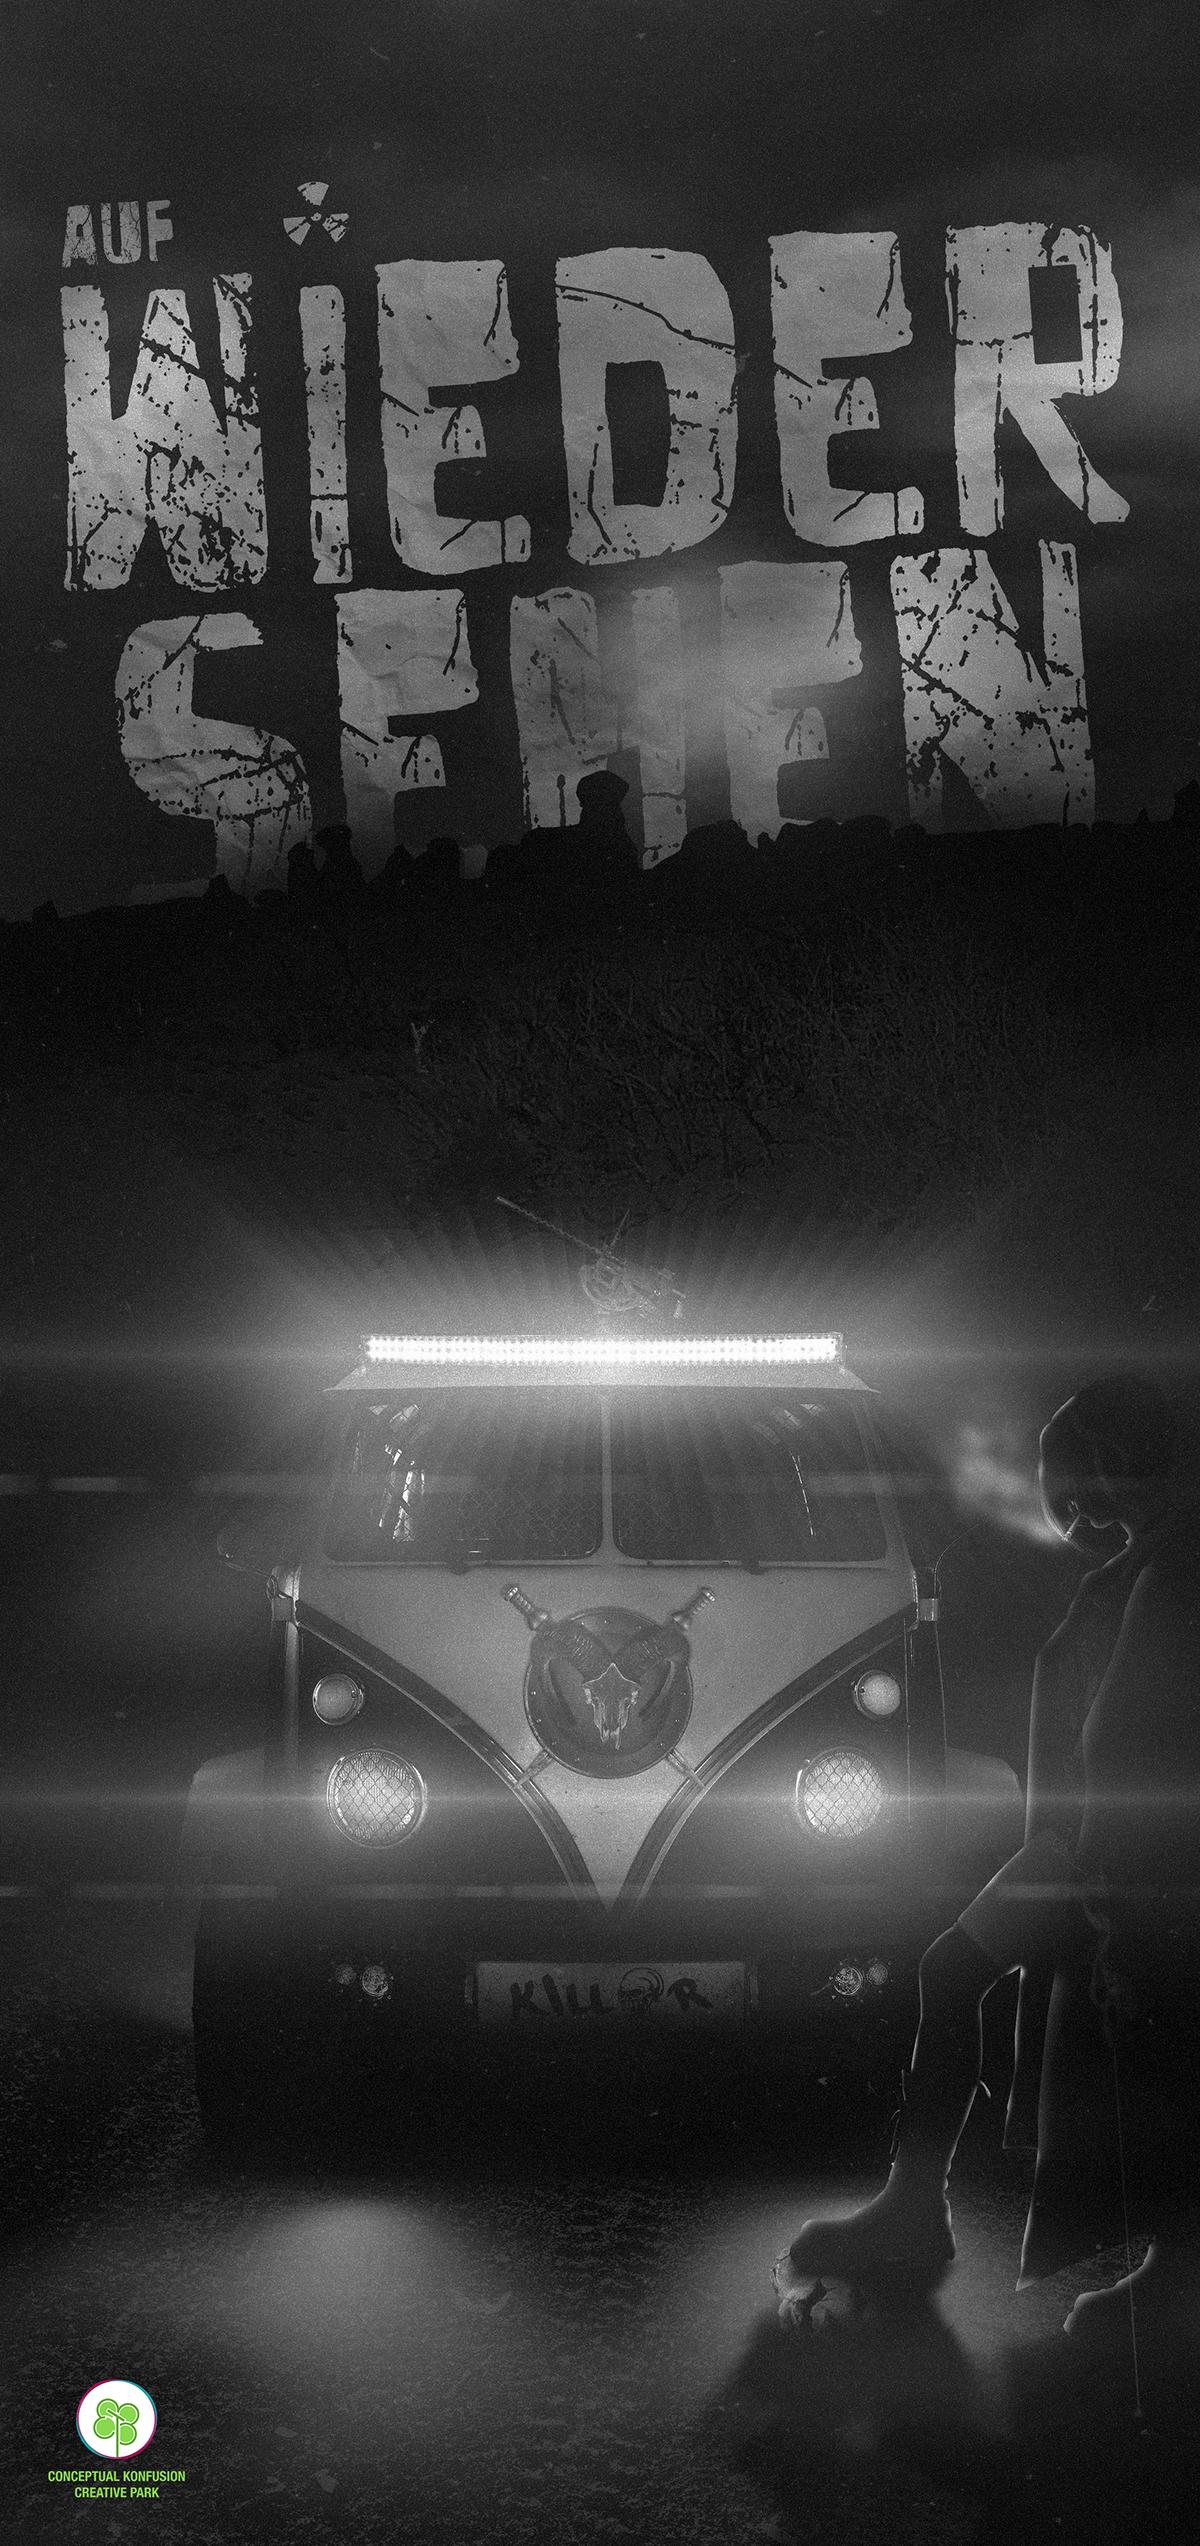 german apocalypse world zombie end fight volkswagon Van Offroad kill